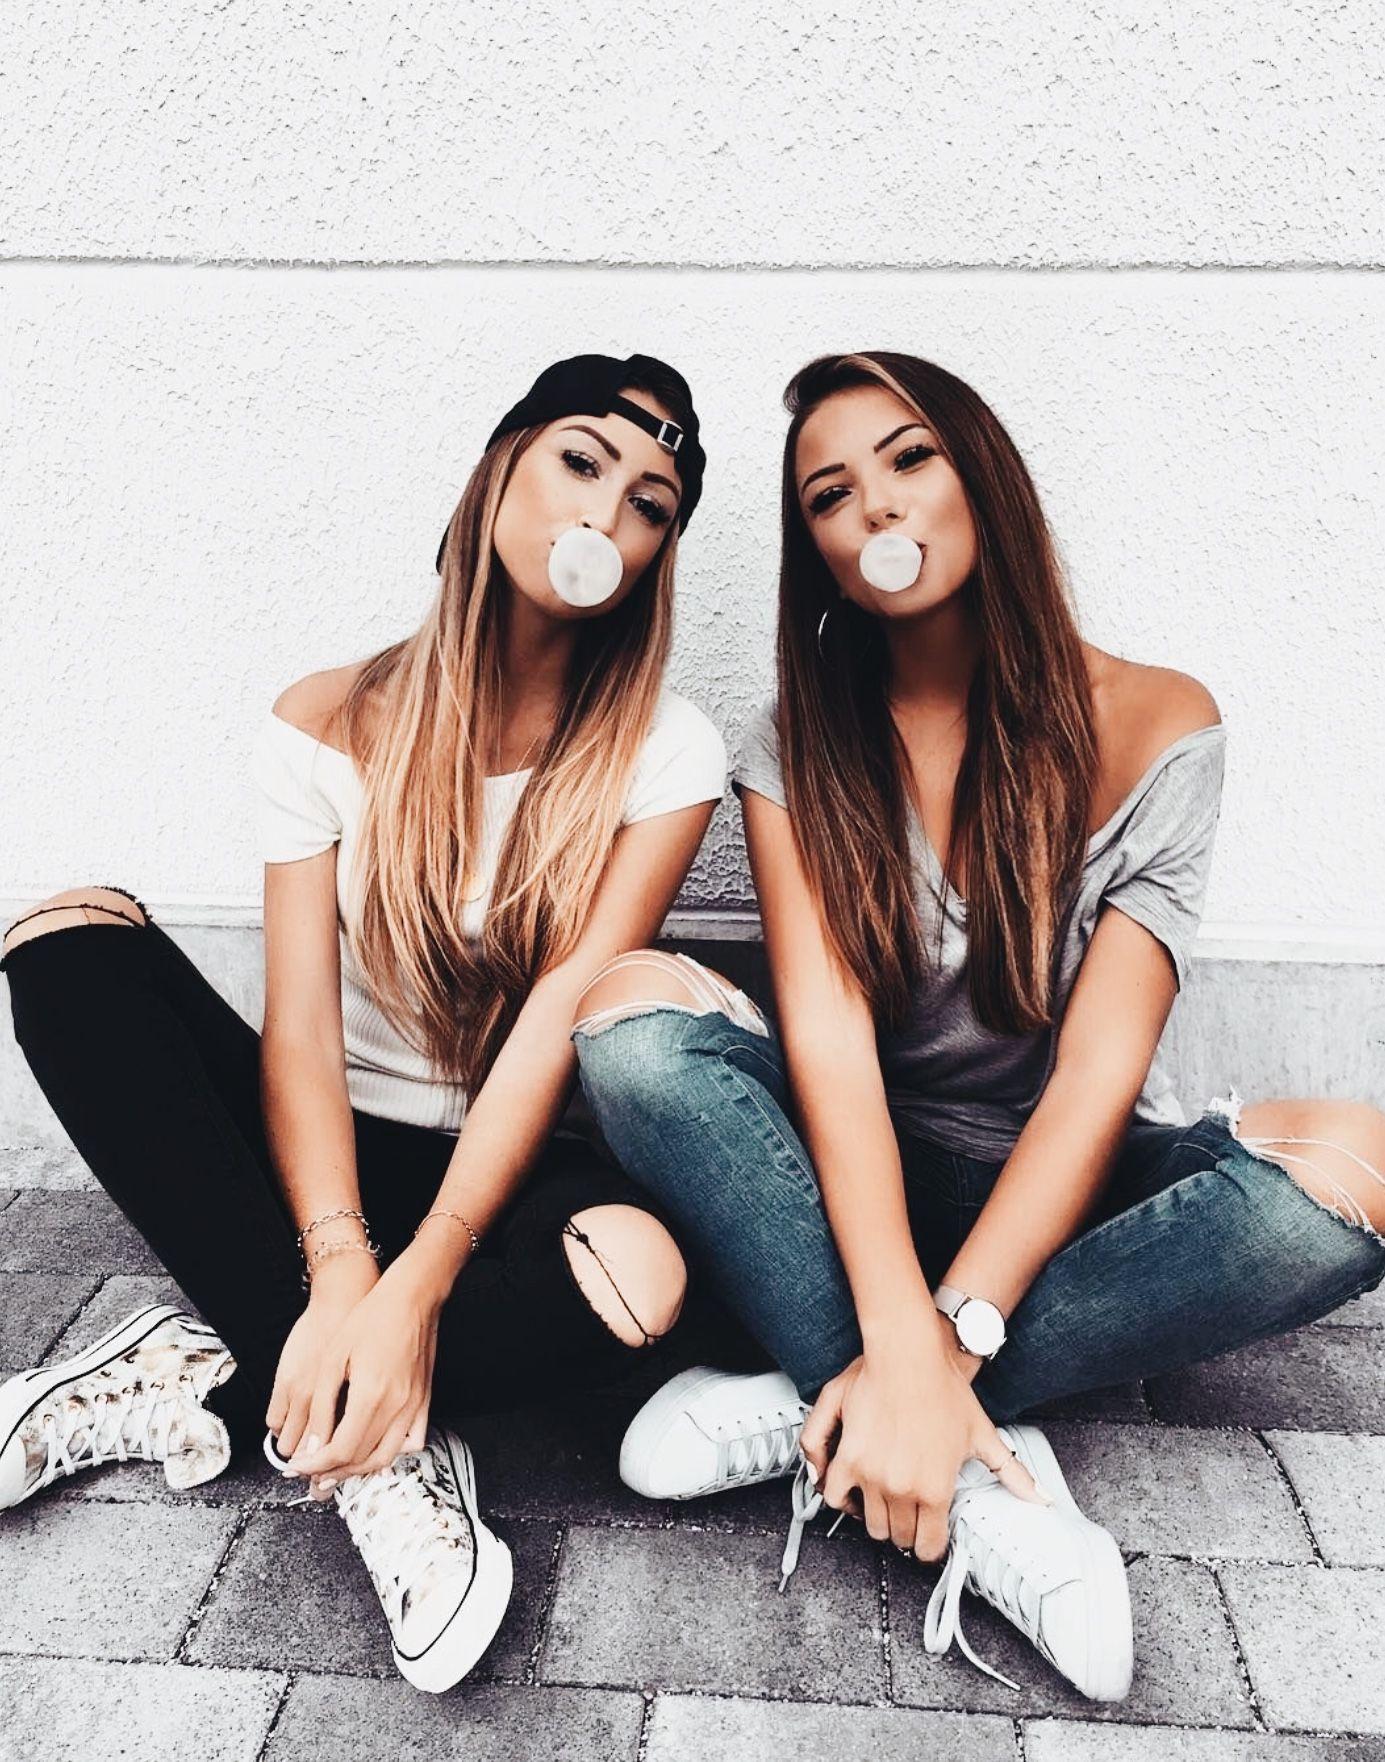 Pinterest: Trinity Dozier Board: friendship goals If you follow me I will follow you Fotos